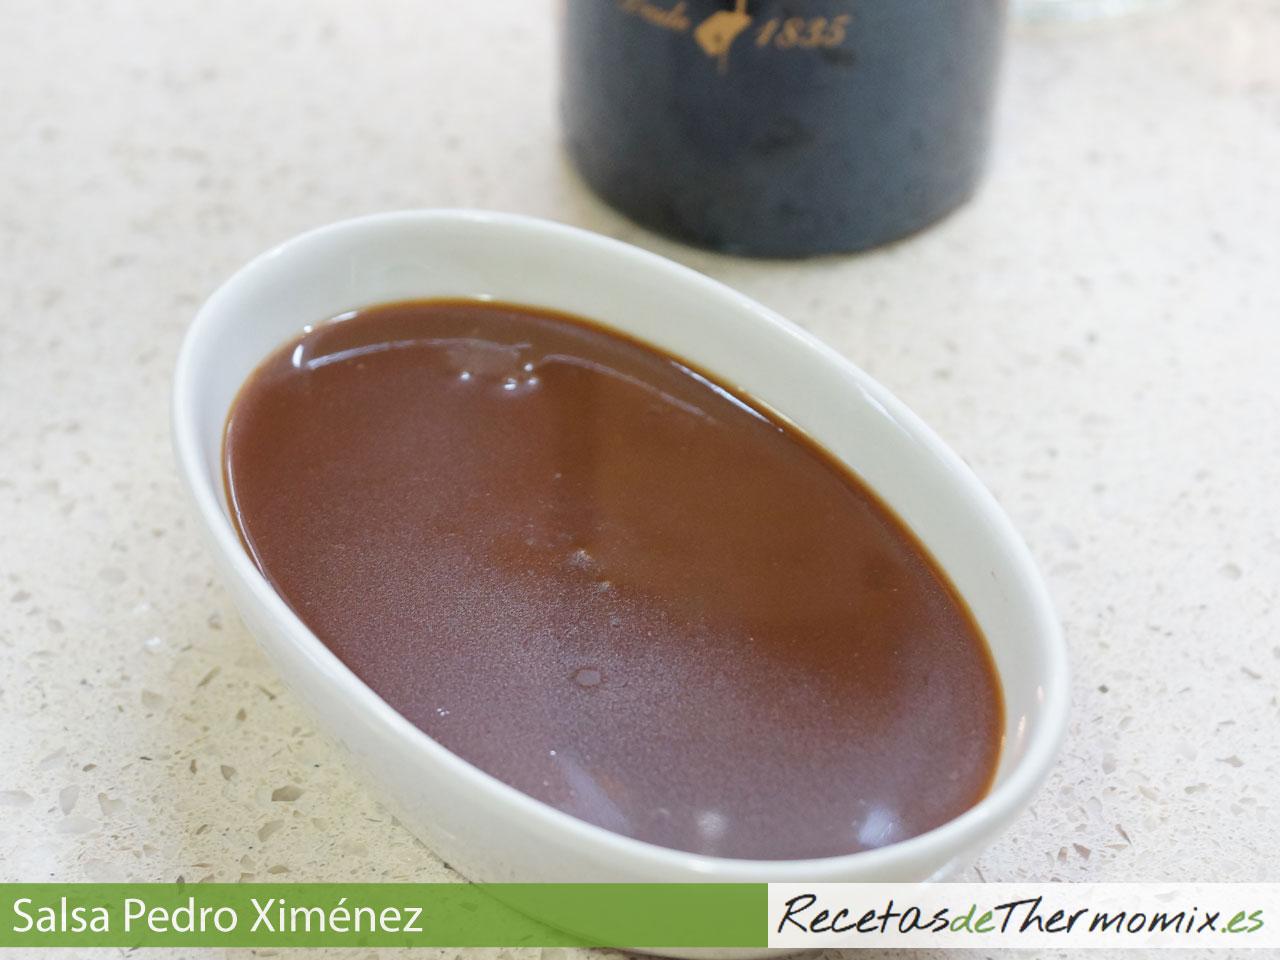 Salsa Pedro Ximenez Thermomix